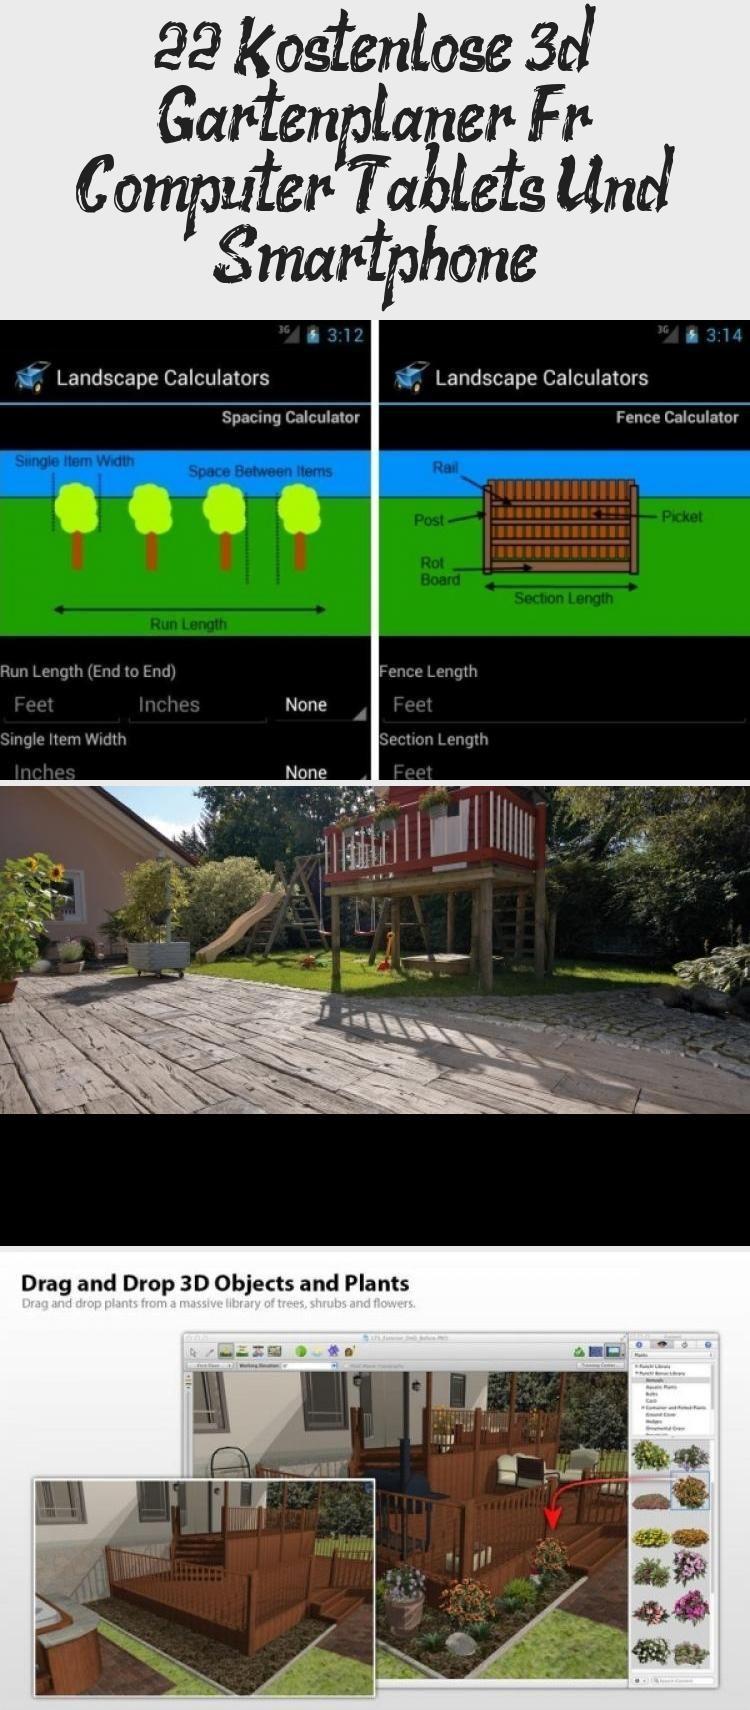 Planer Landschaftsbau Online Software Mein Schoener Garten Planungstool Gartenplanungideen Gartenplanunggestaltung Gartenplanunghang In 2020 Landscape Fence Tablet